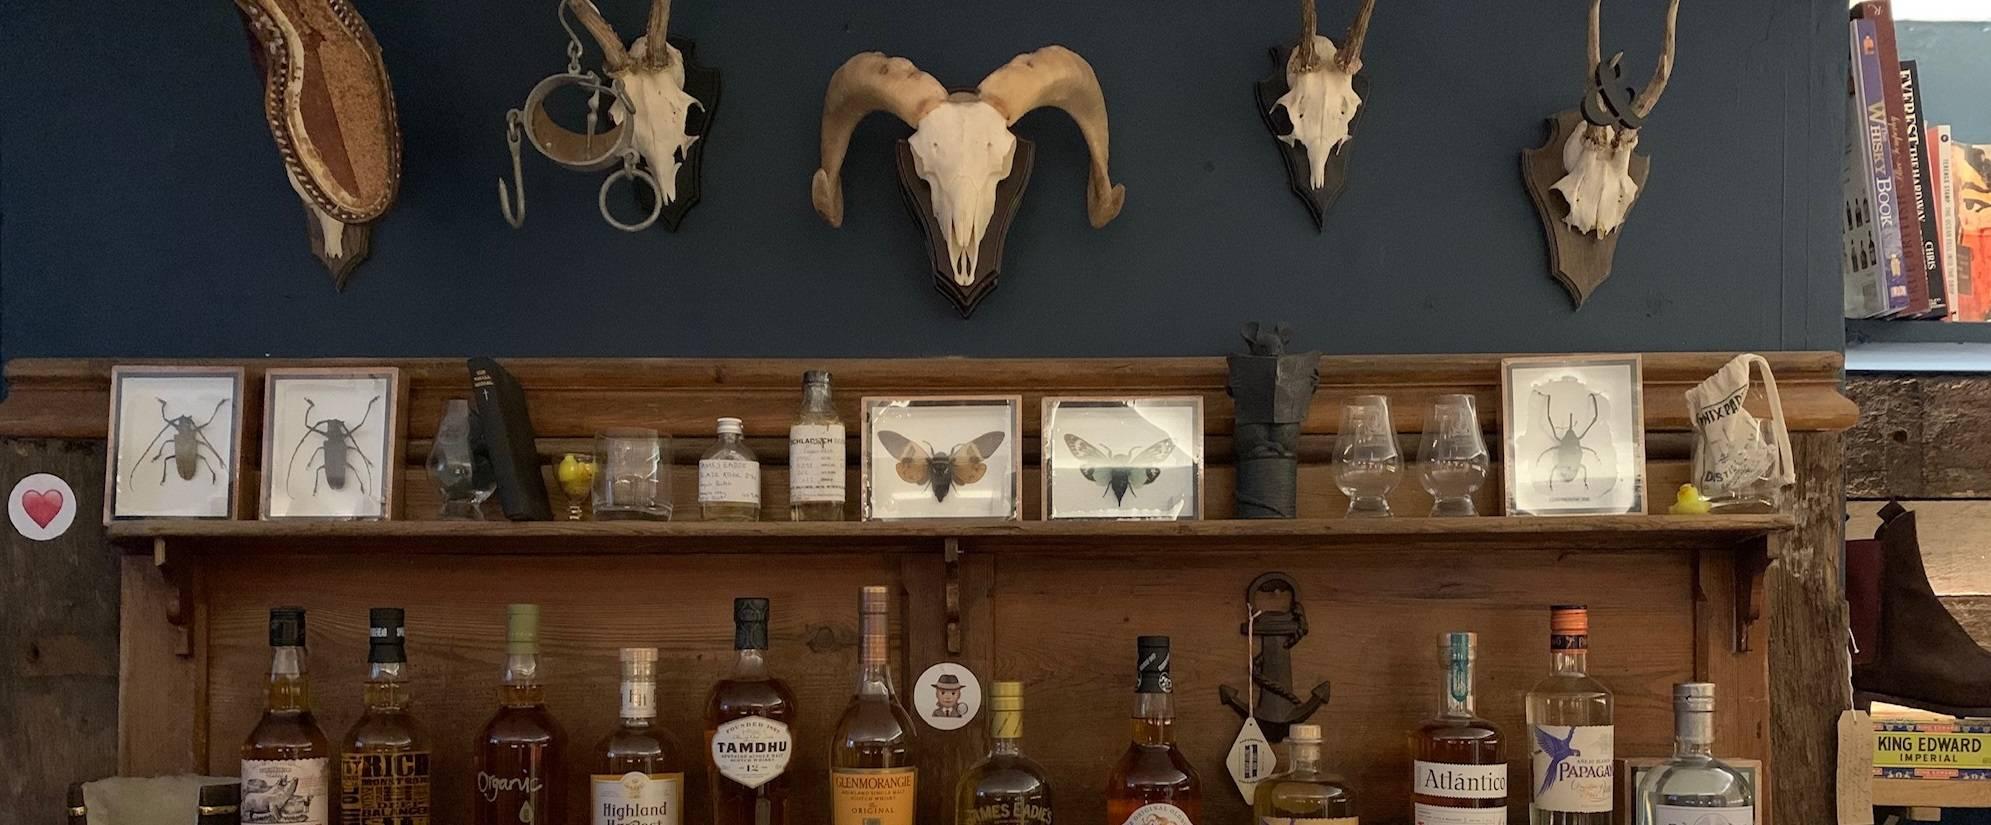 Biodynamic Wine, organic whiskey, single malt, gin, rum and beer